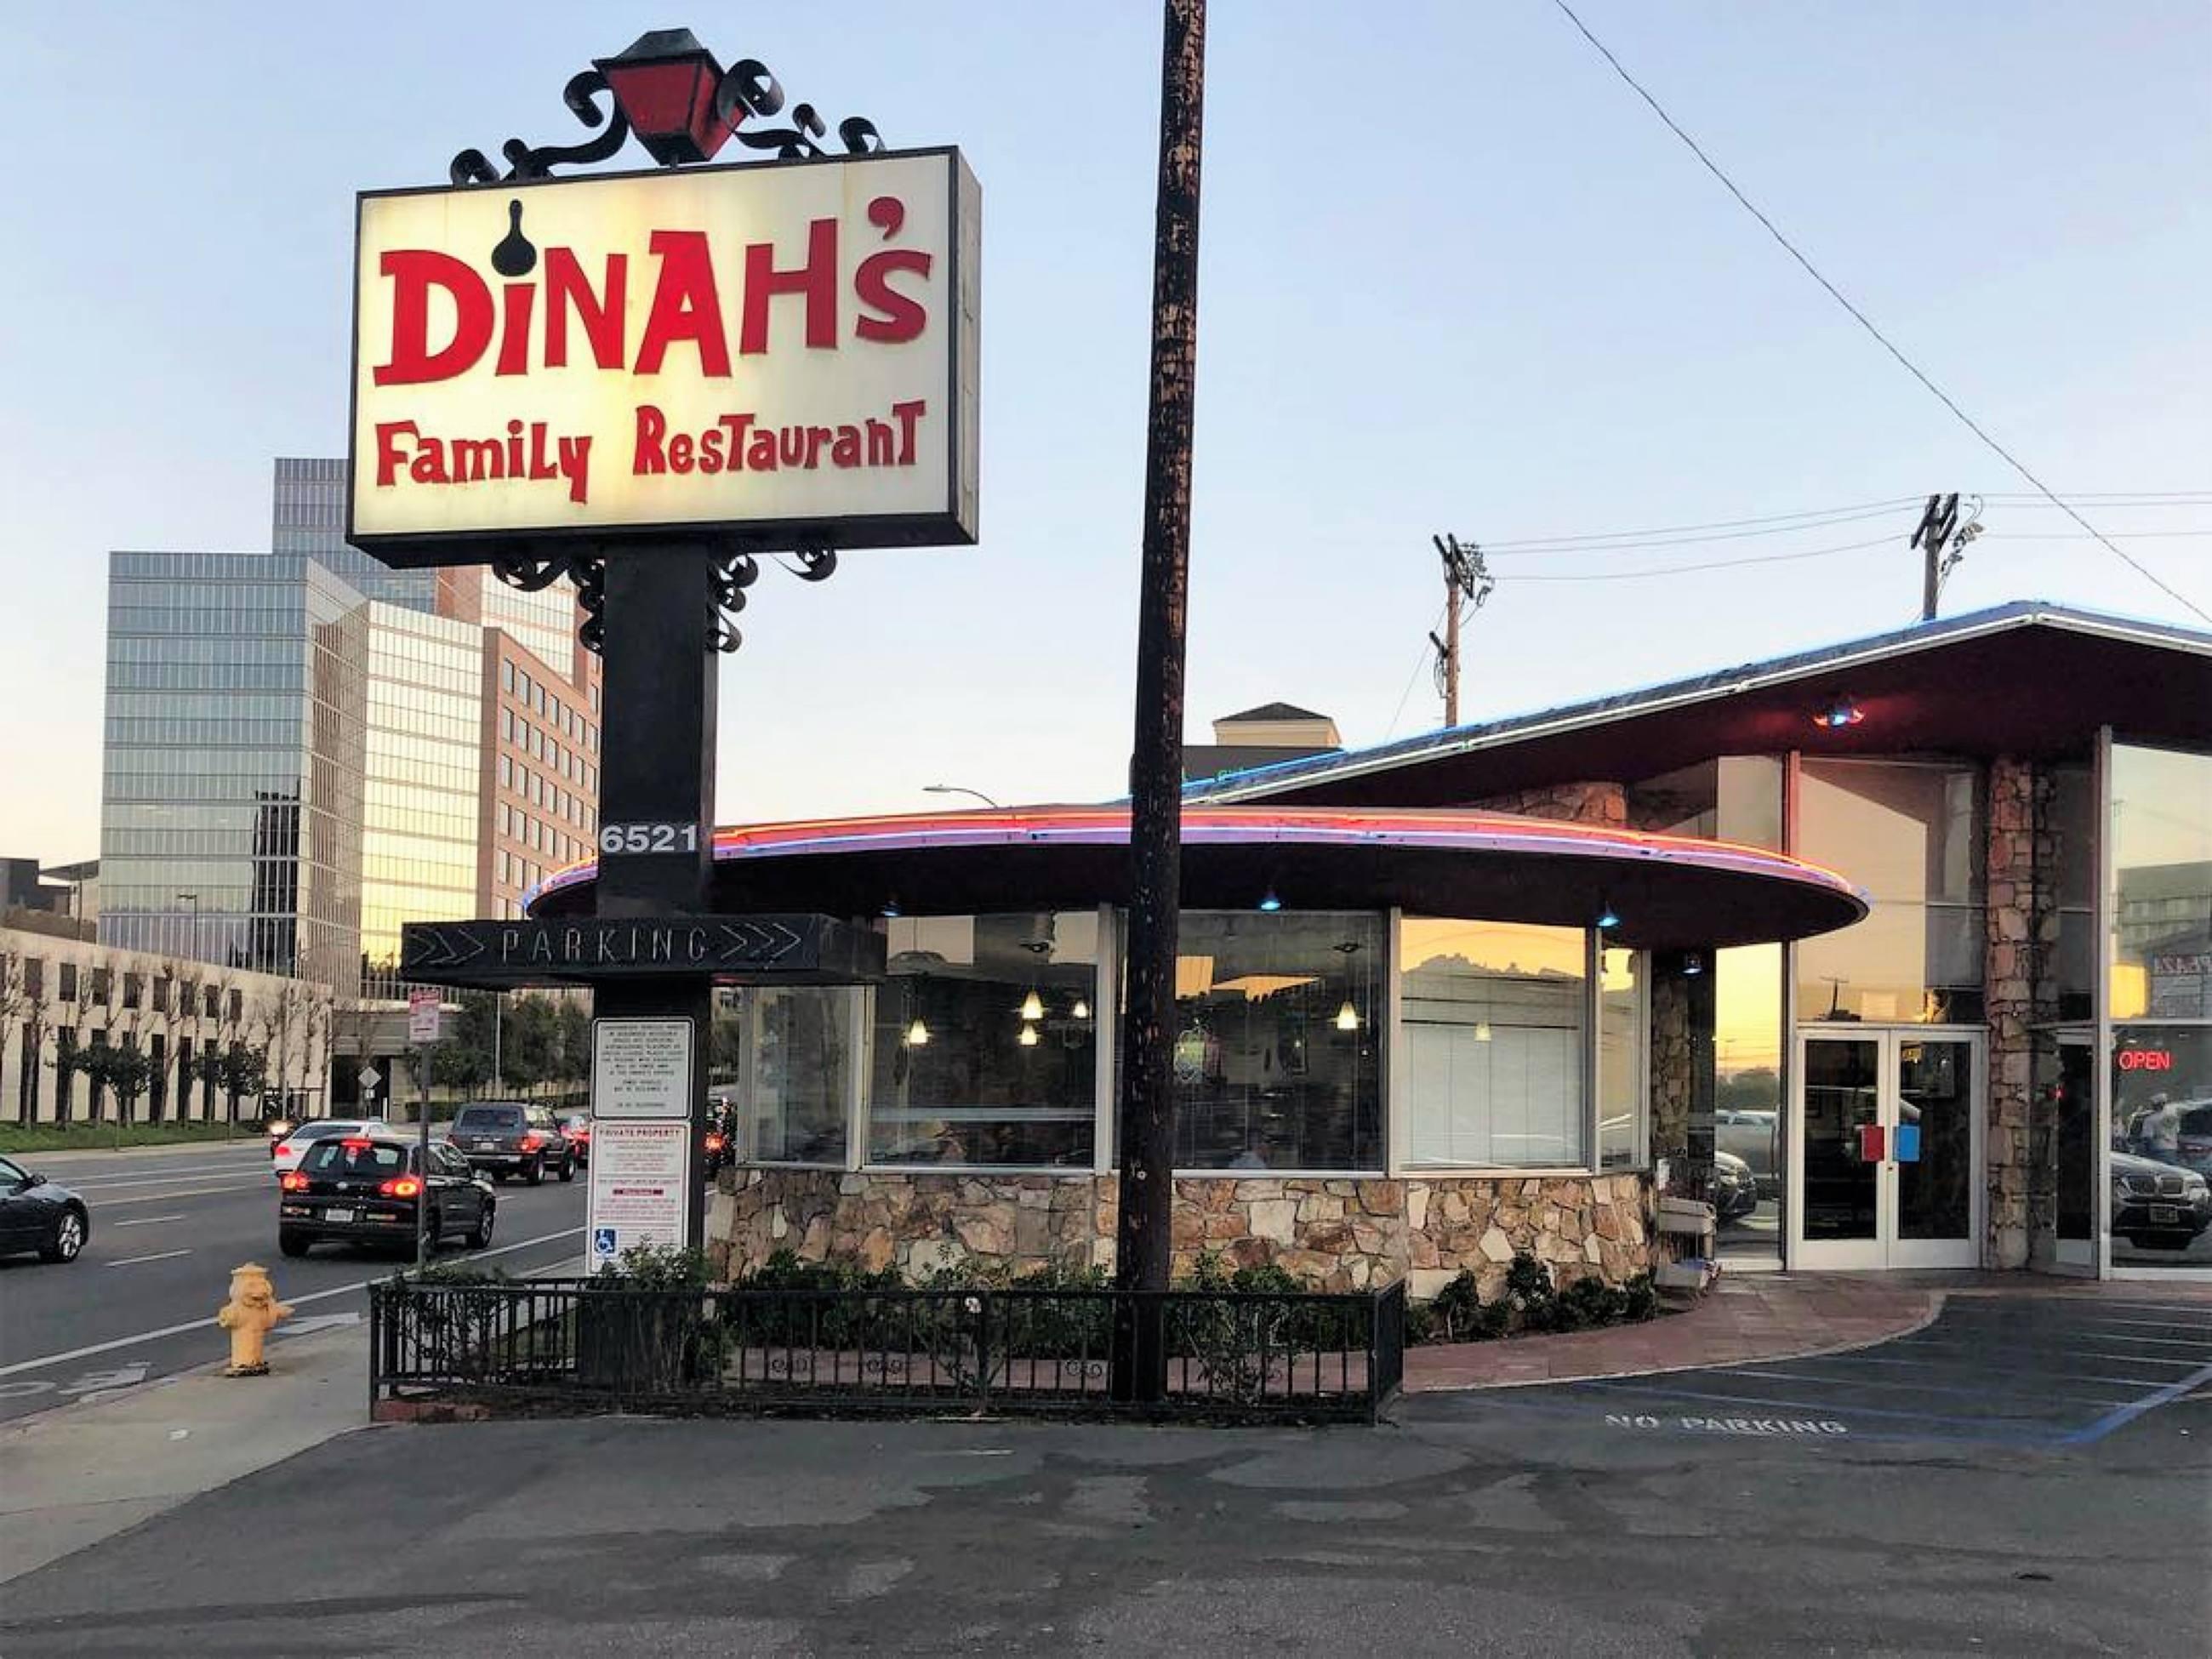 Exterior of Dinah's Family Restaurant